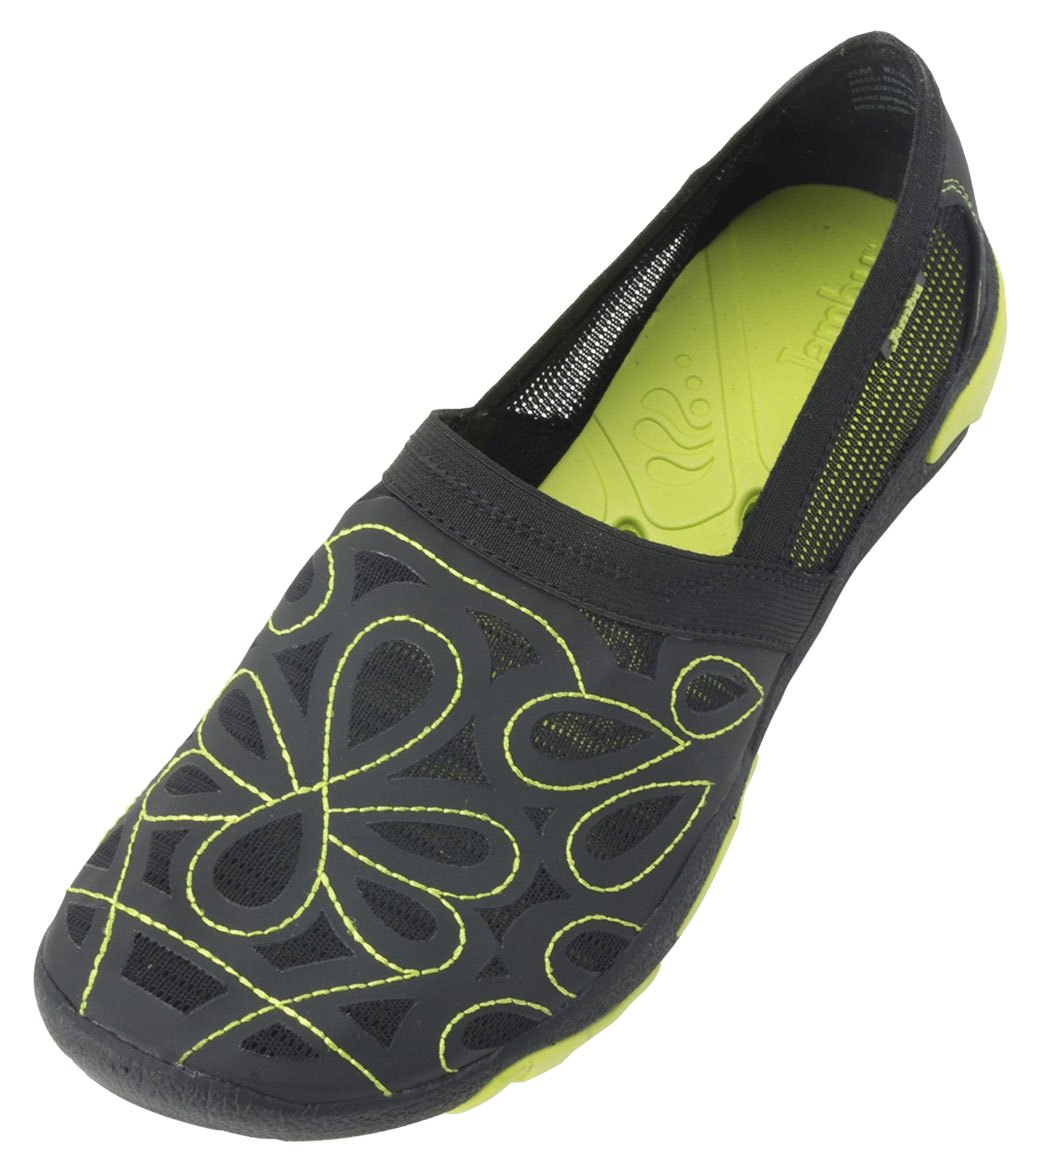 94a73a96345d Jambu Women s Drizzle Terra Marine Water Shoes at SwimOutlet.com ...